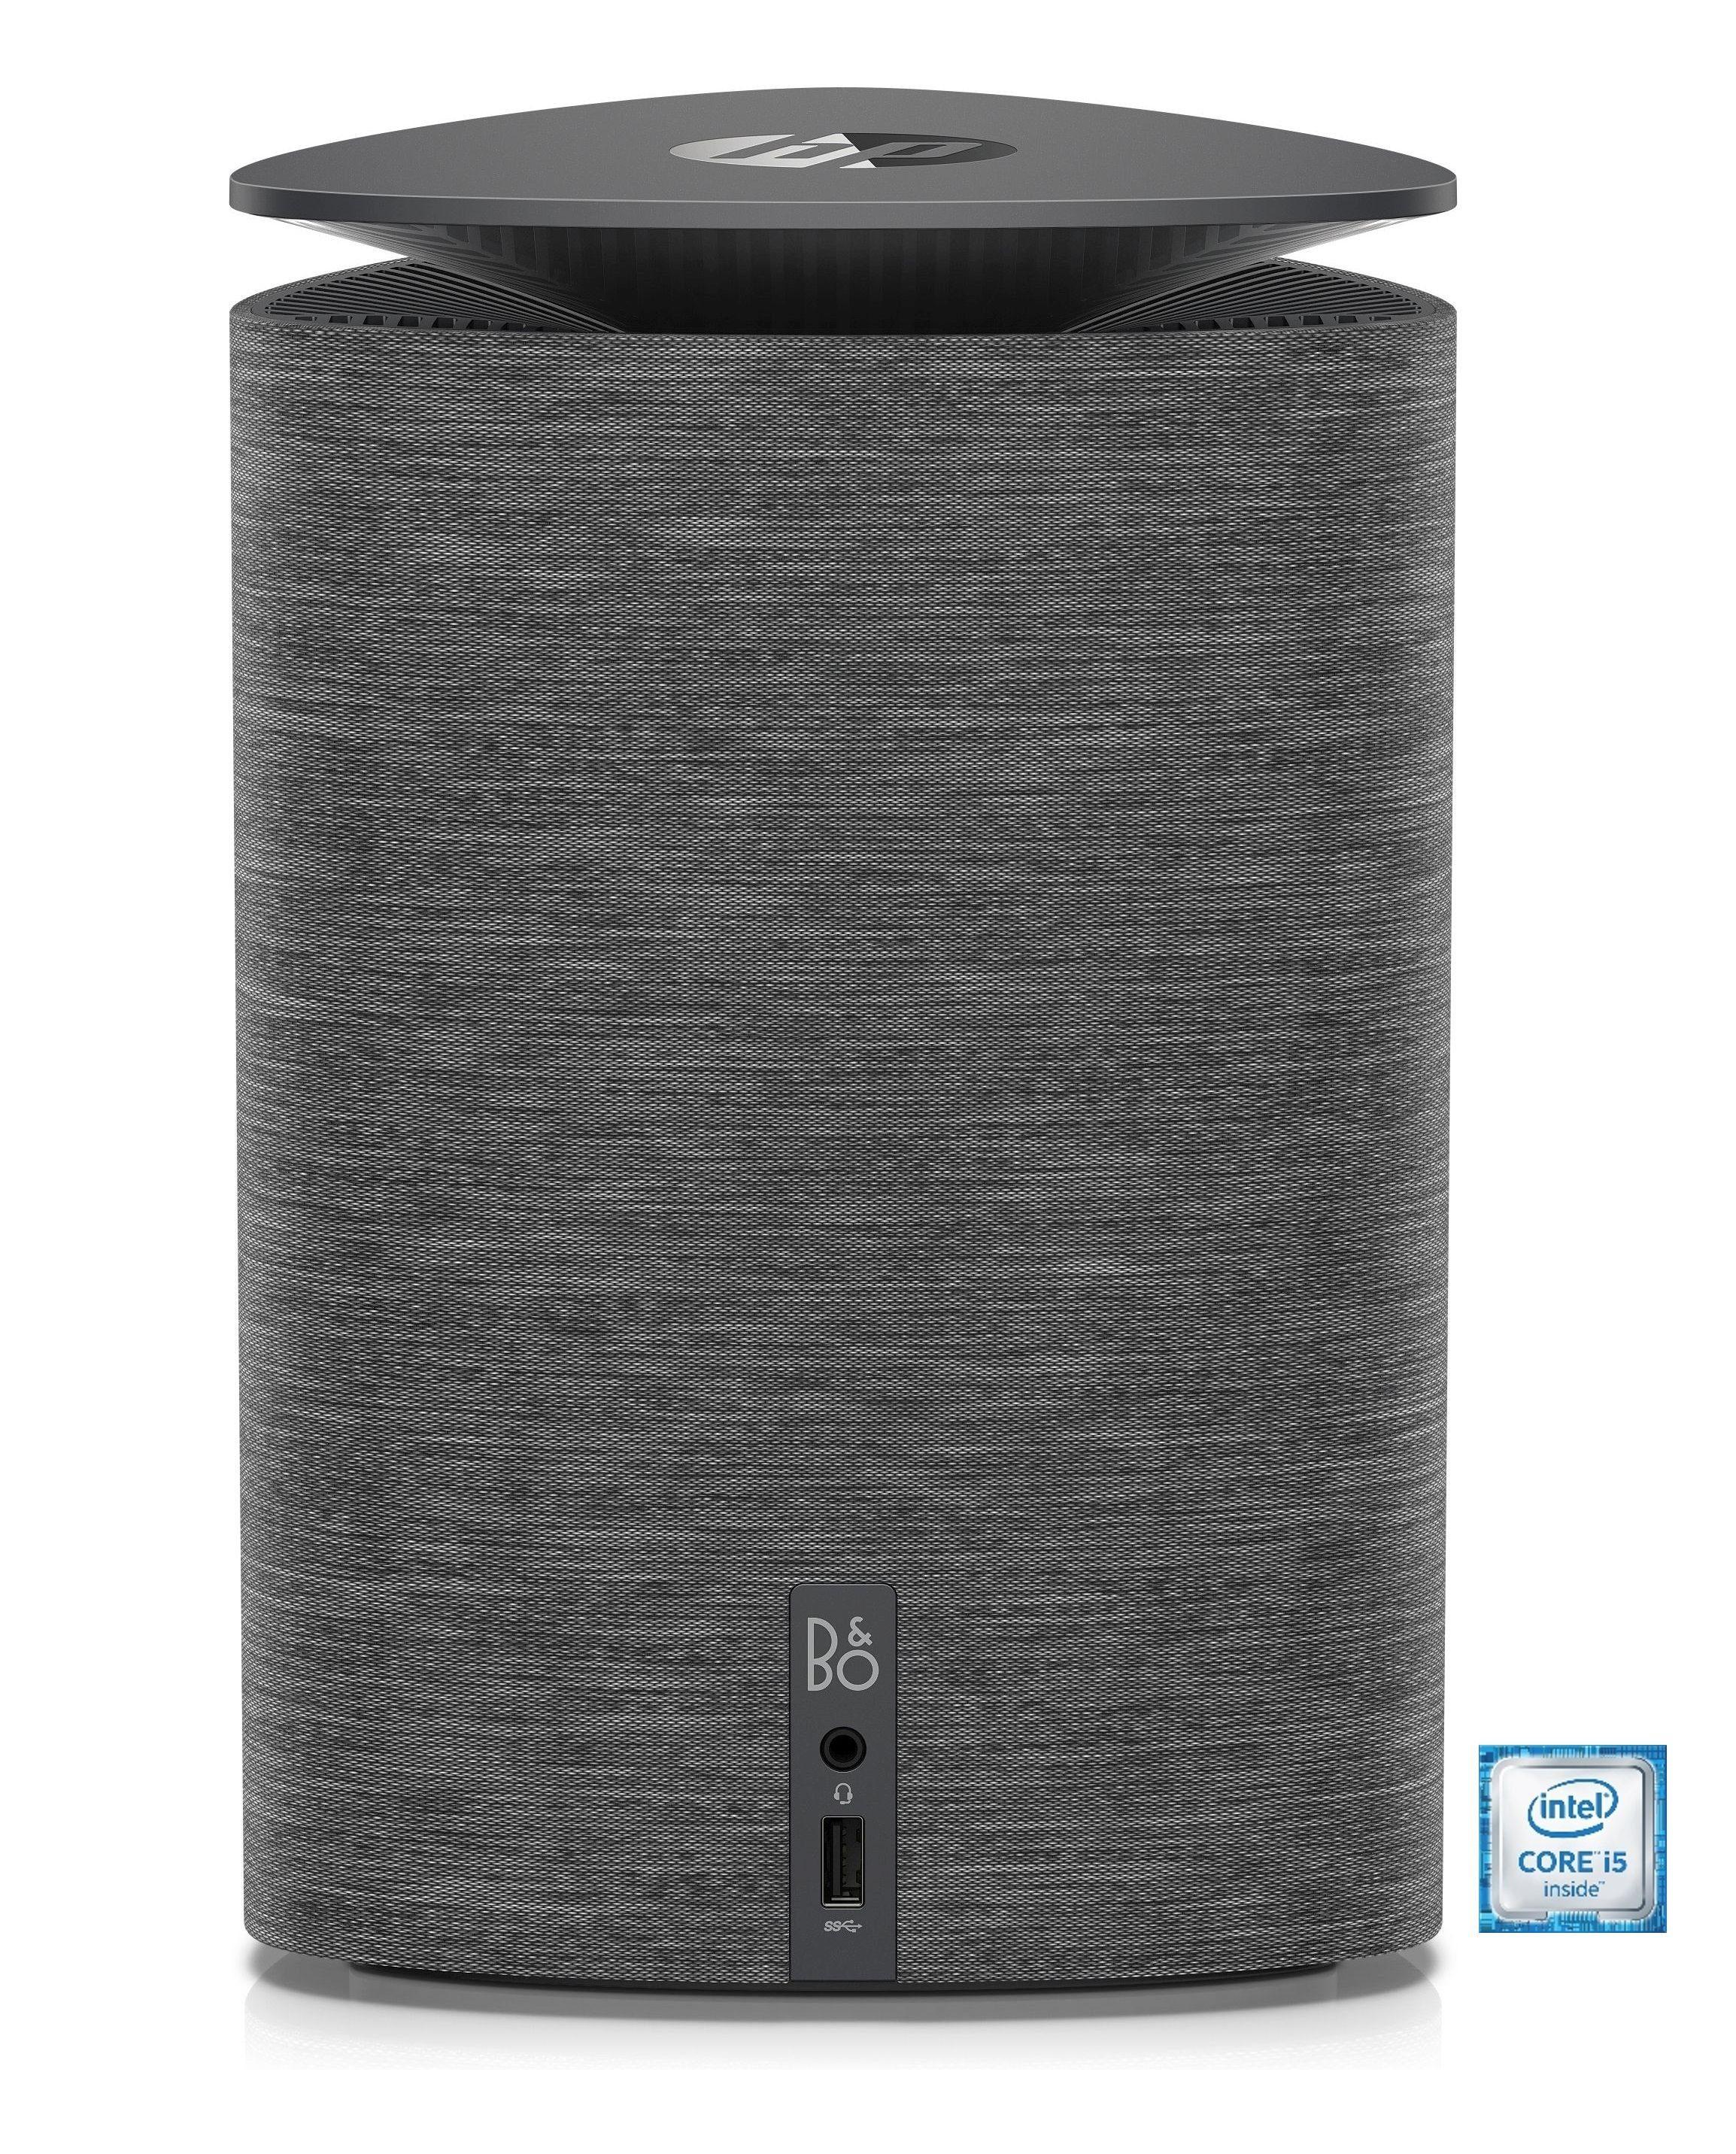 HP Pavilion Wave 600-a002ng Dektop PC »Intel Core i5, AMD R9 M470, 128 GB + 1 TB, 8 GB«